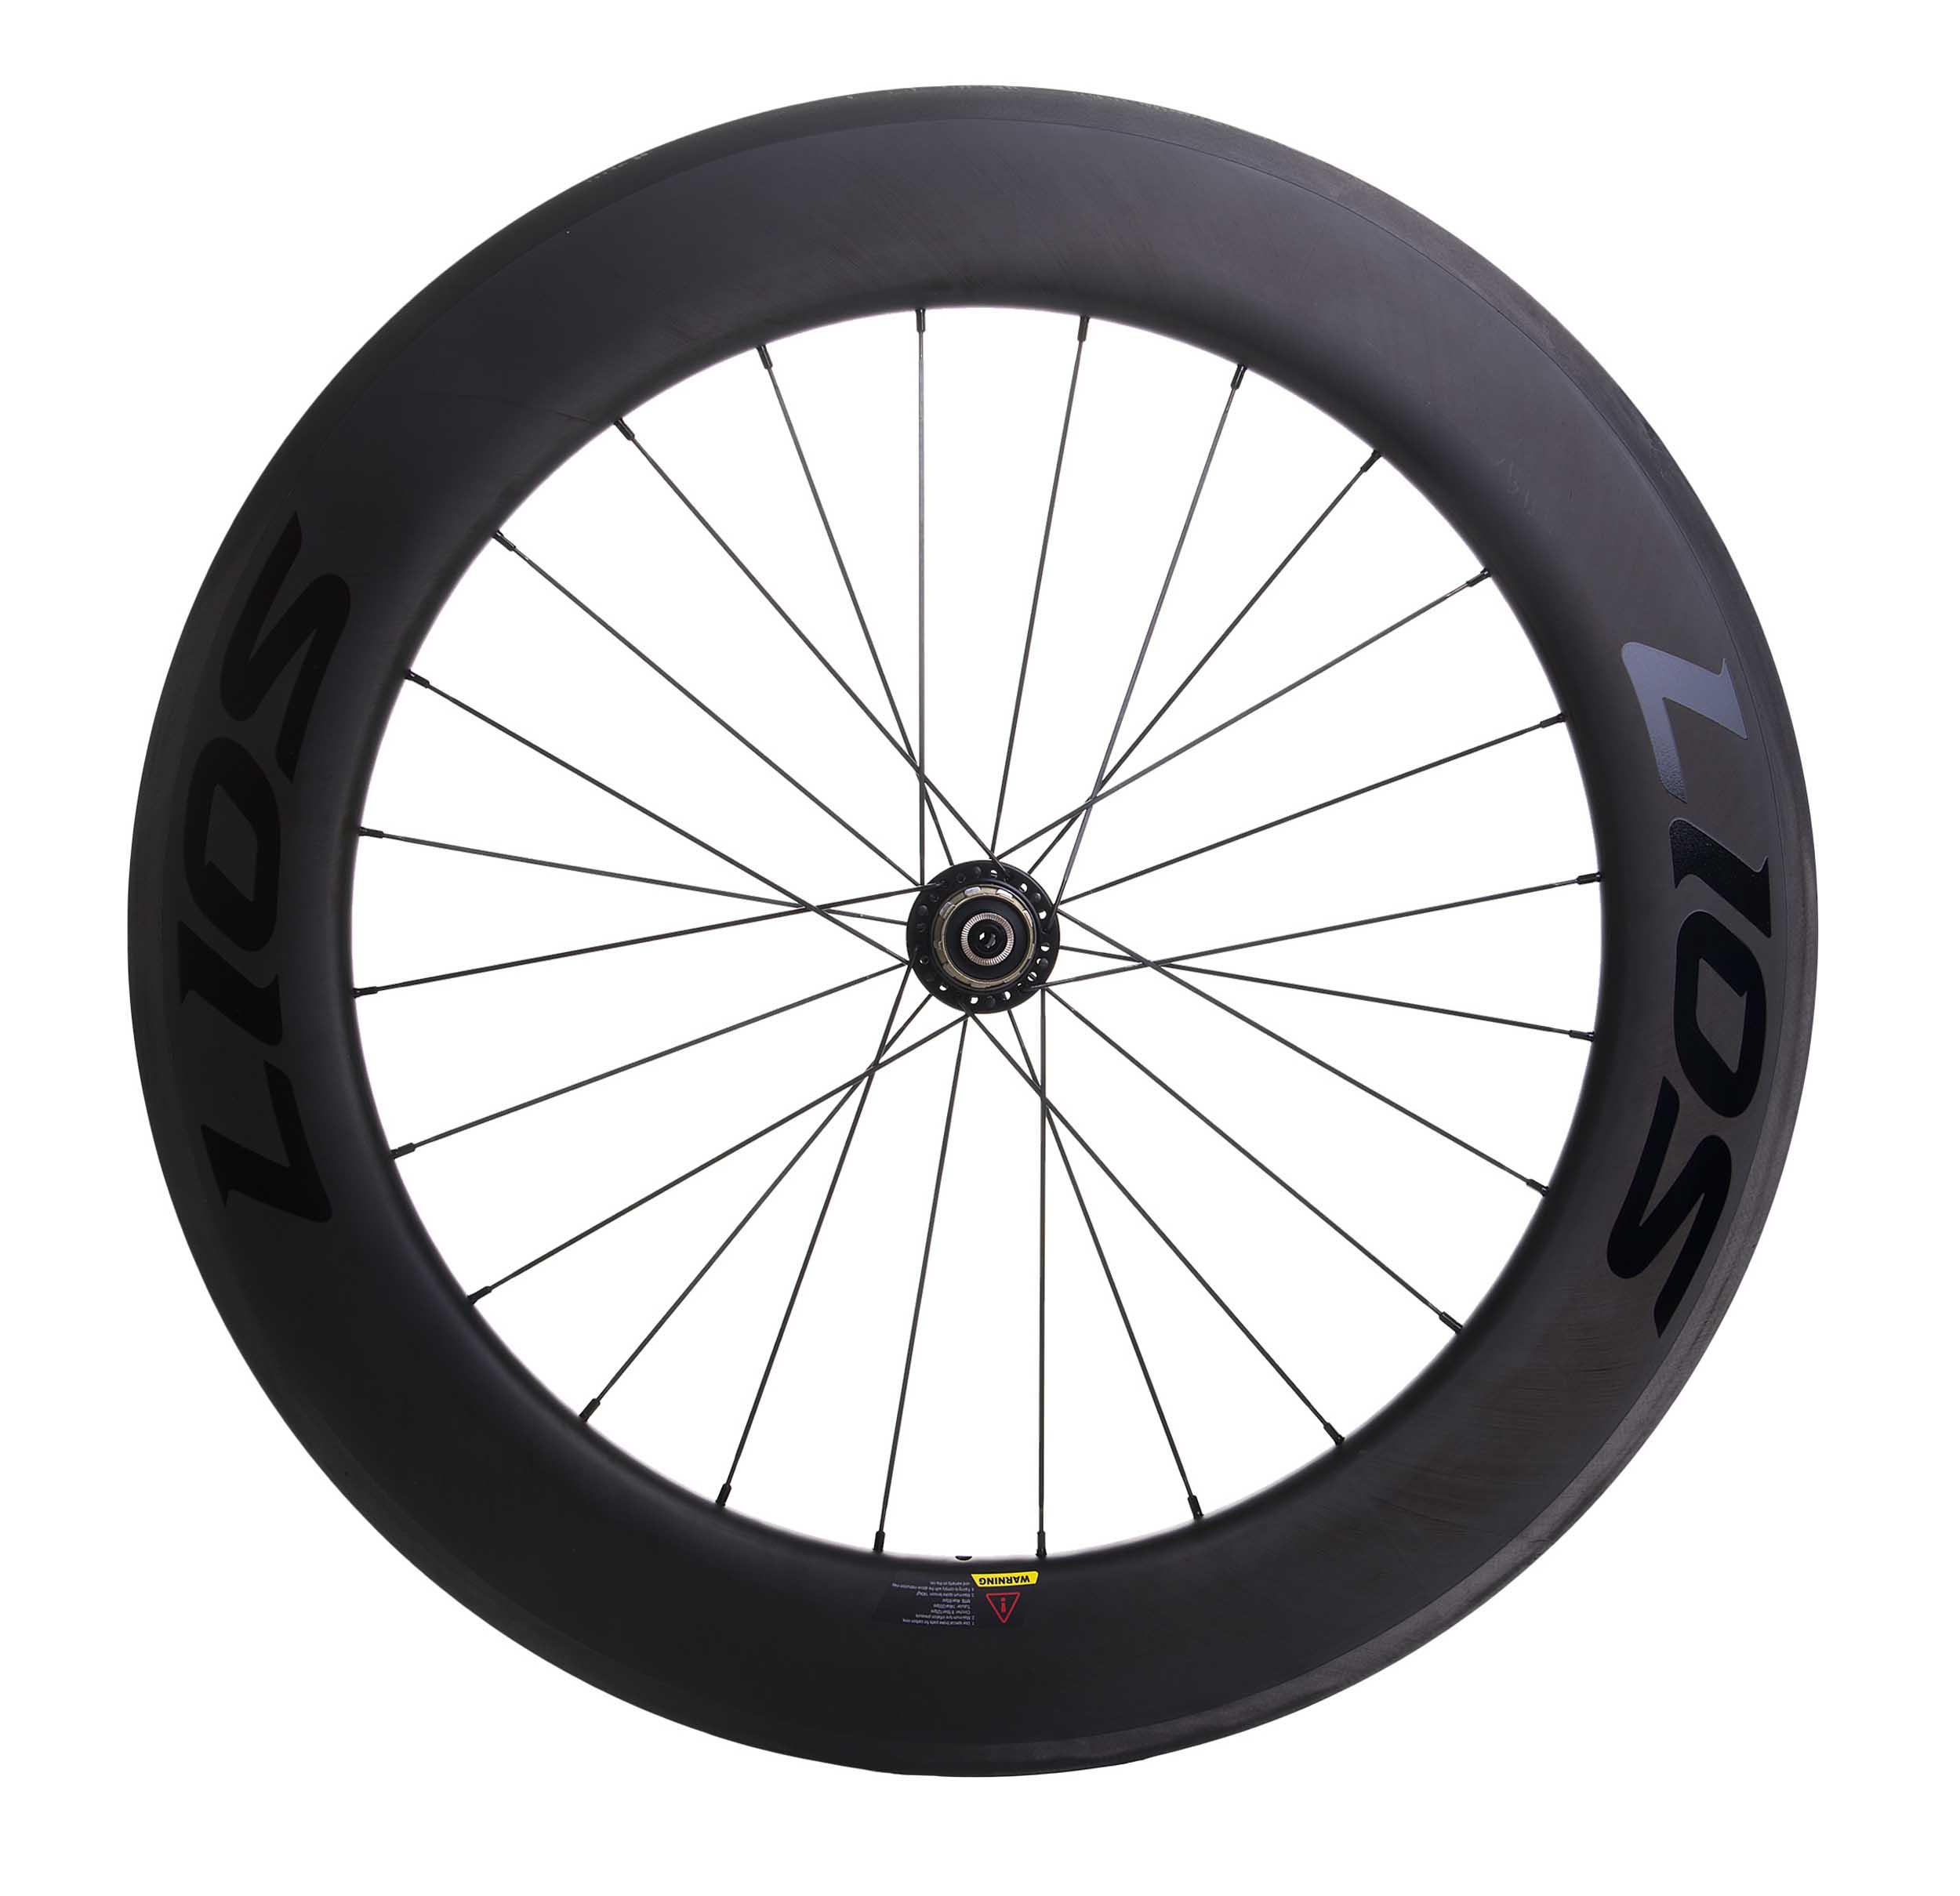 lios-c80-carbon-wheelset-black-image-3.jpg